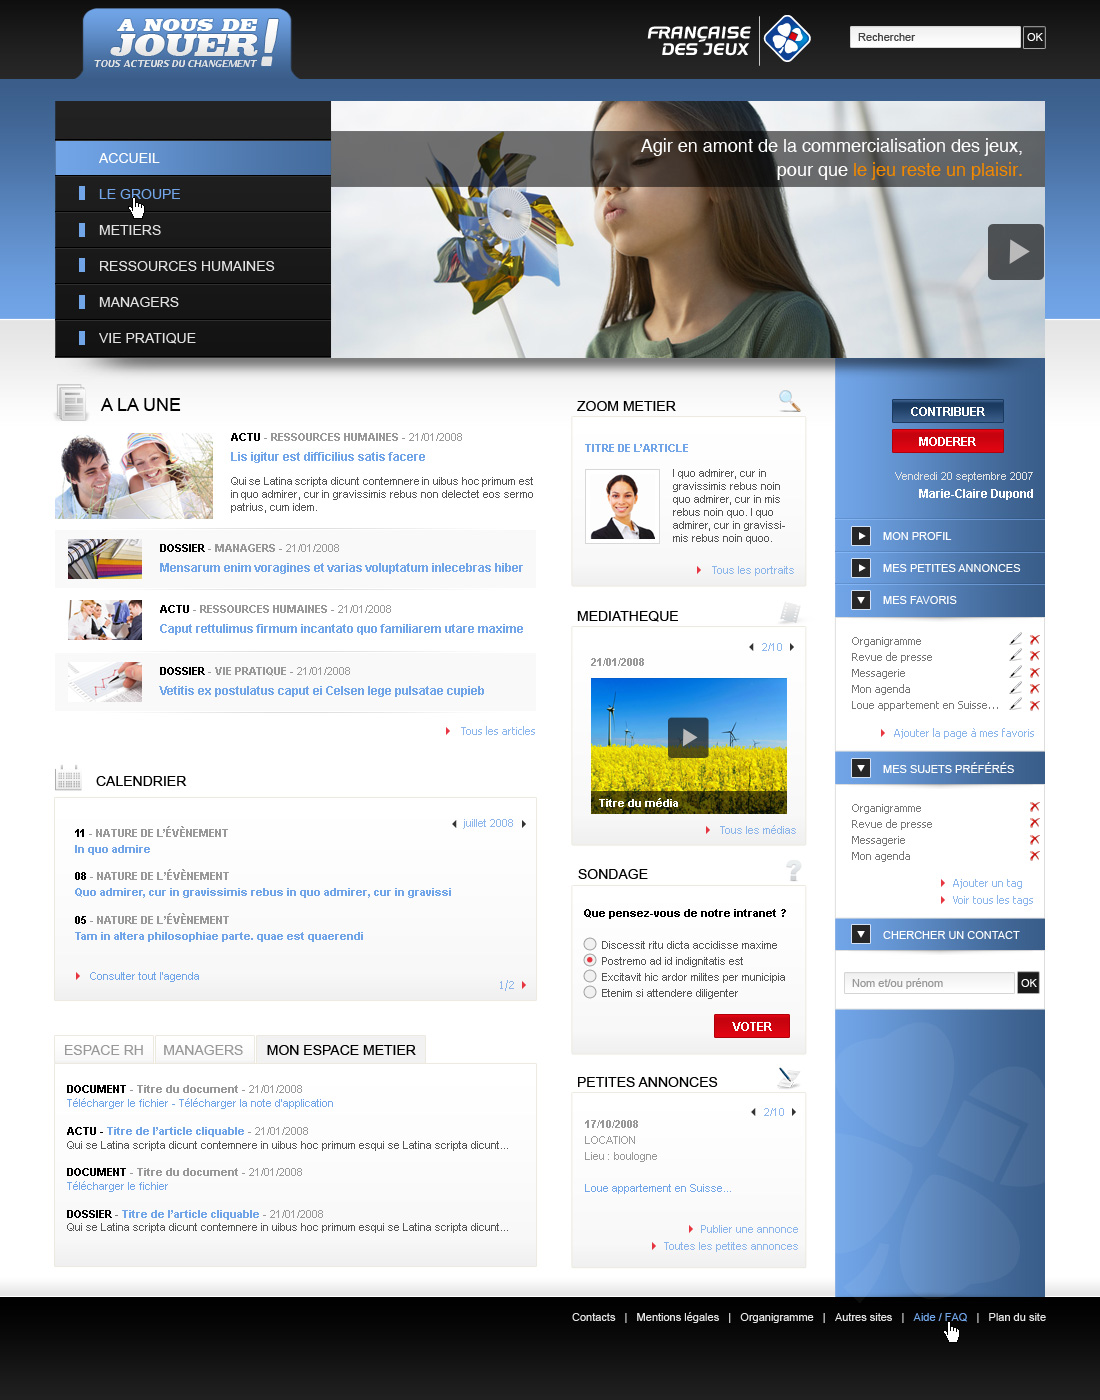 fdj-intranet-1